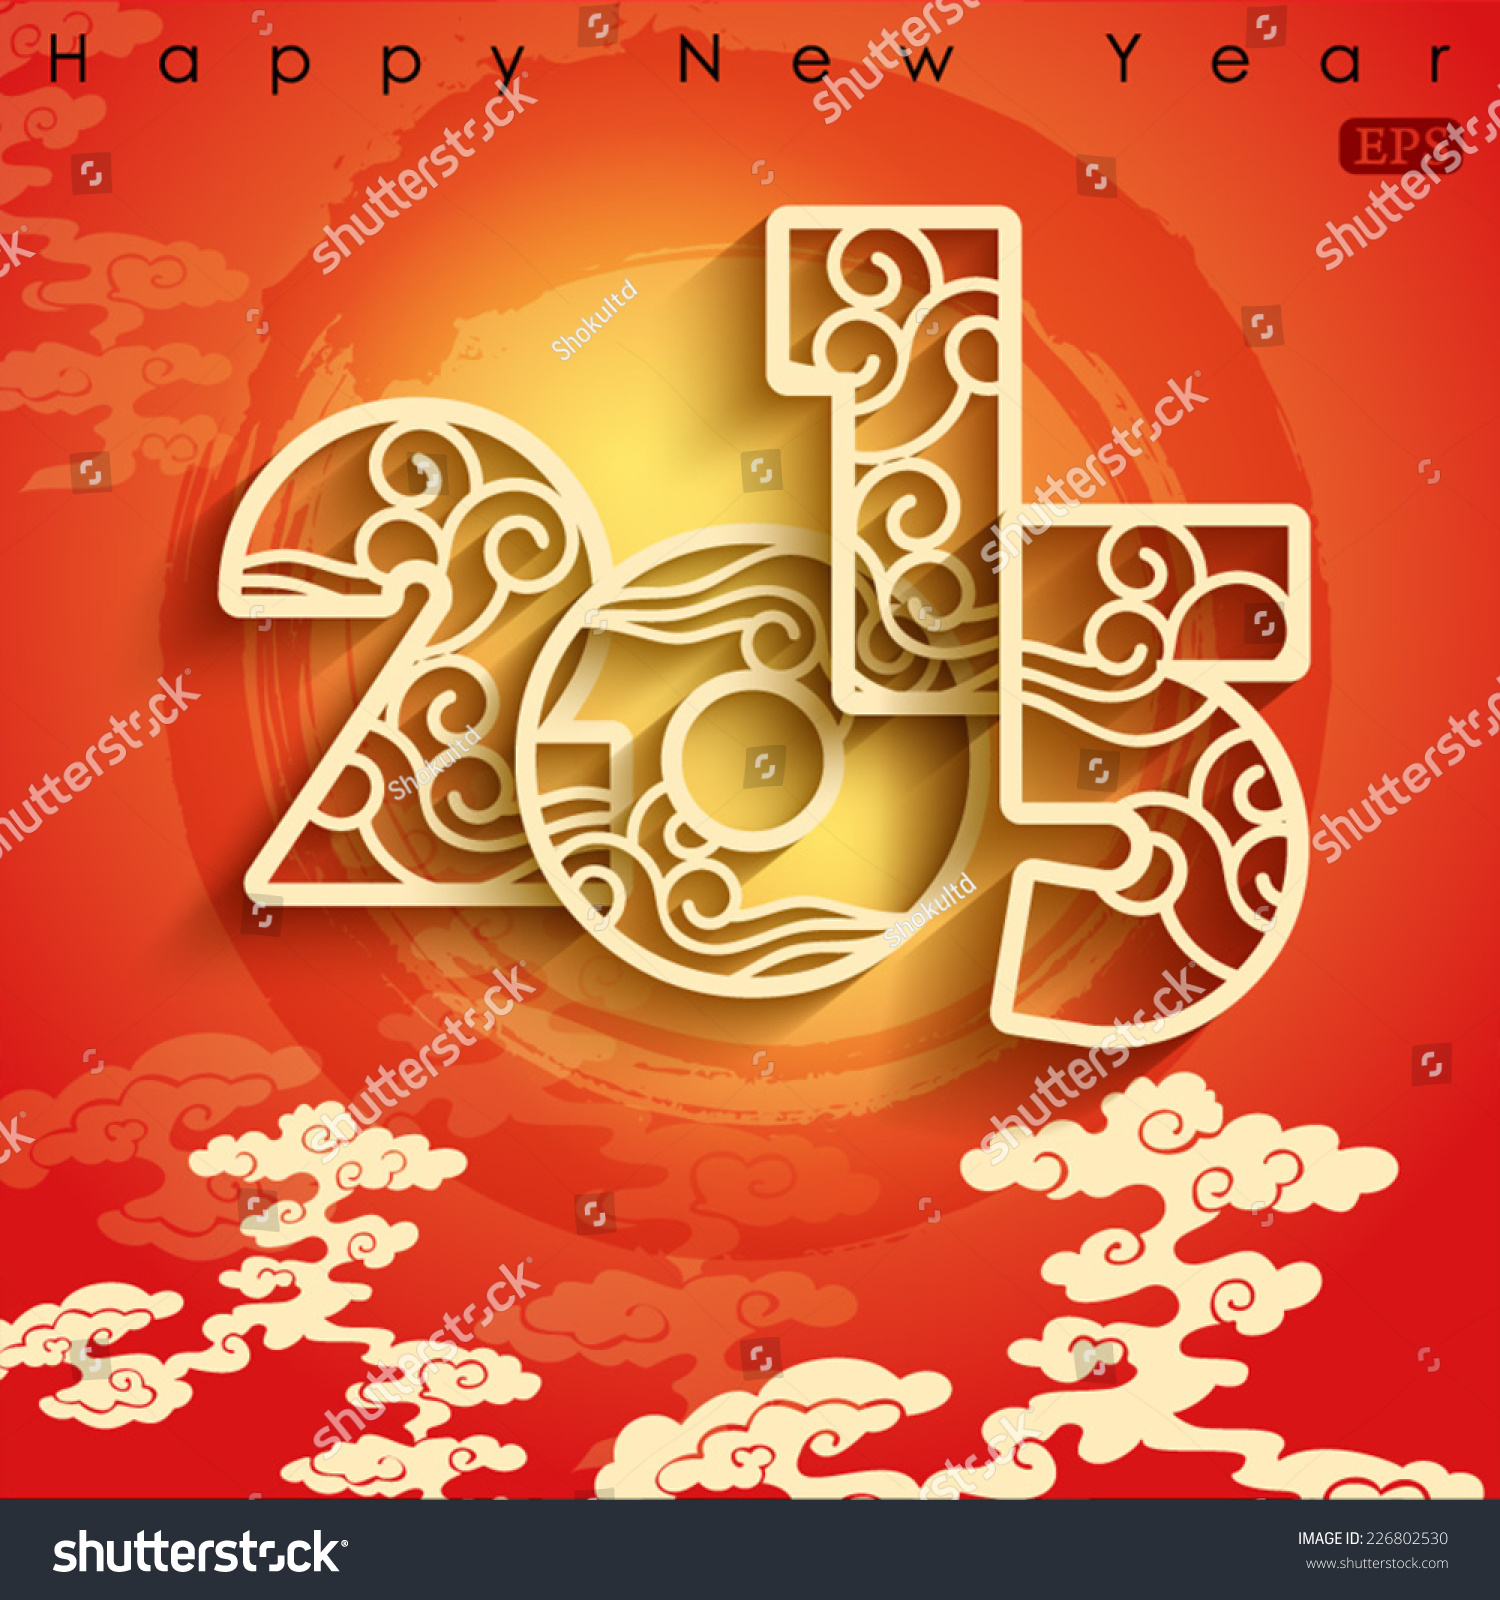 New year card design 2015